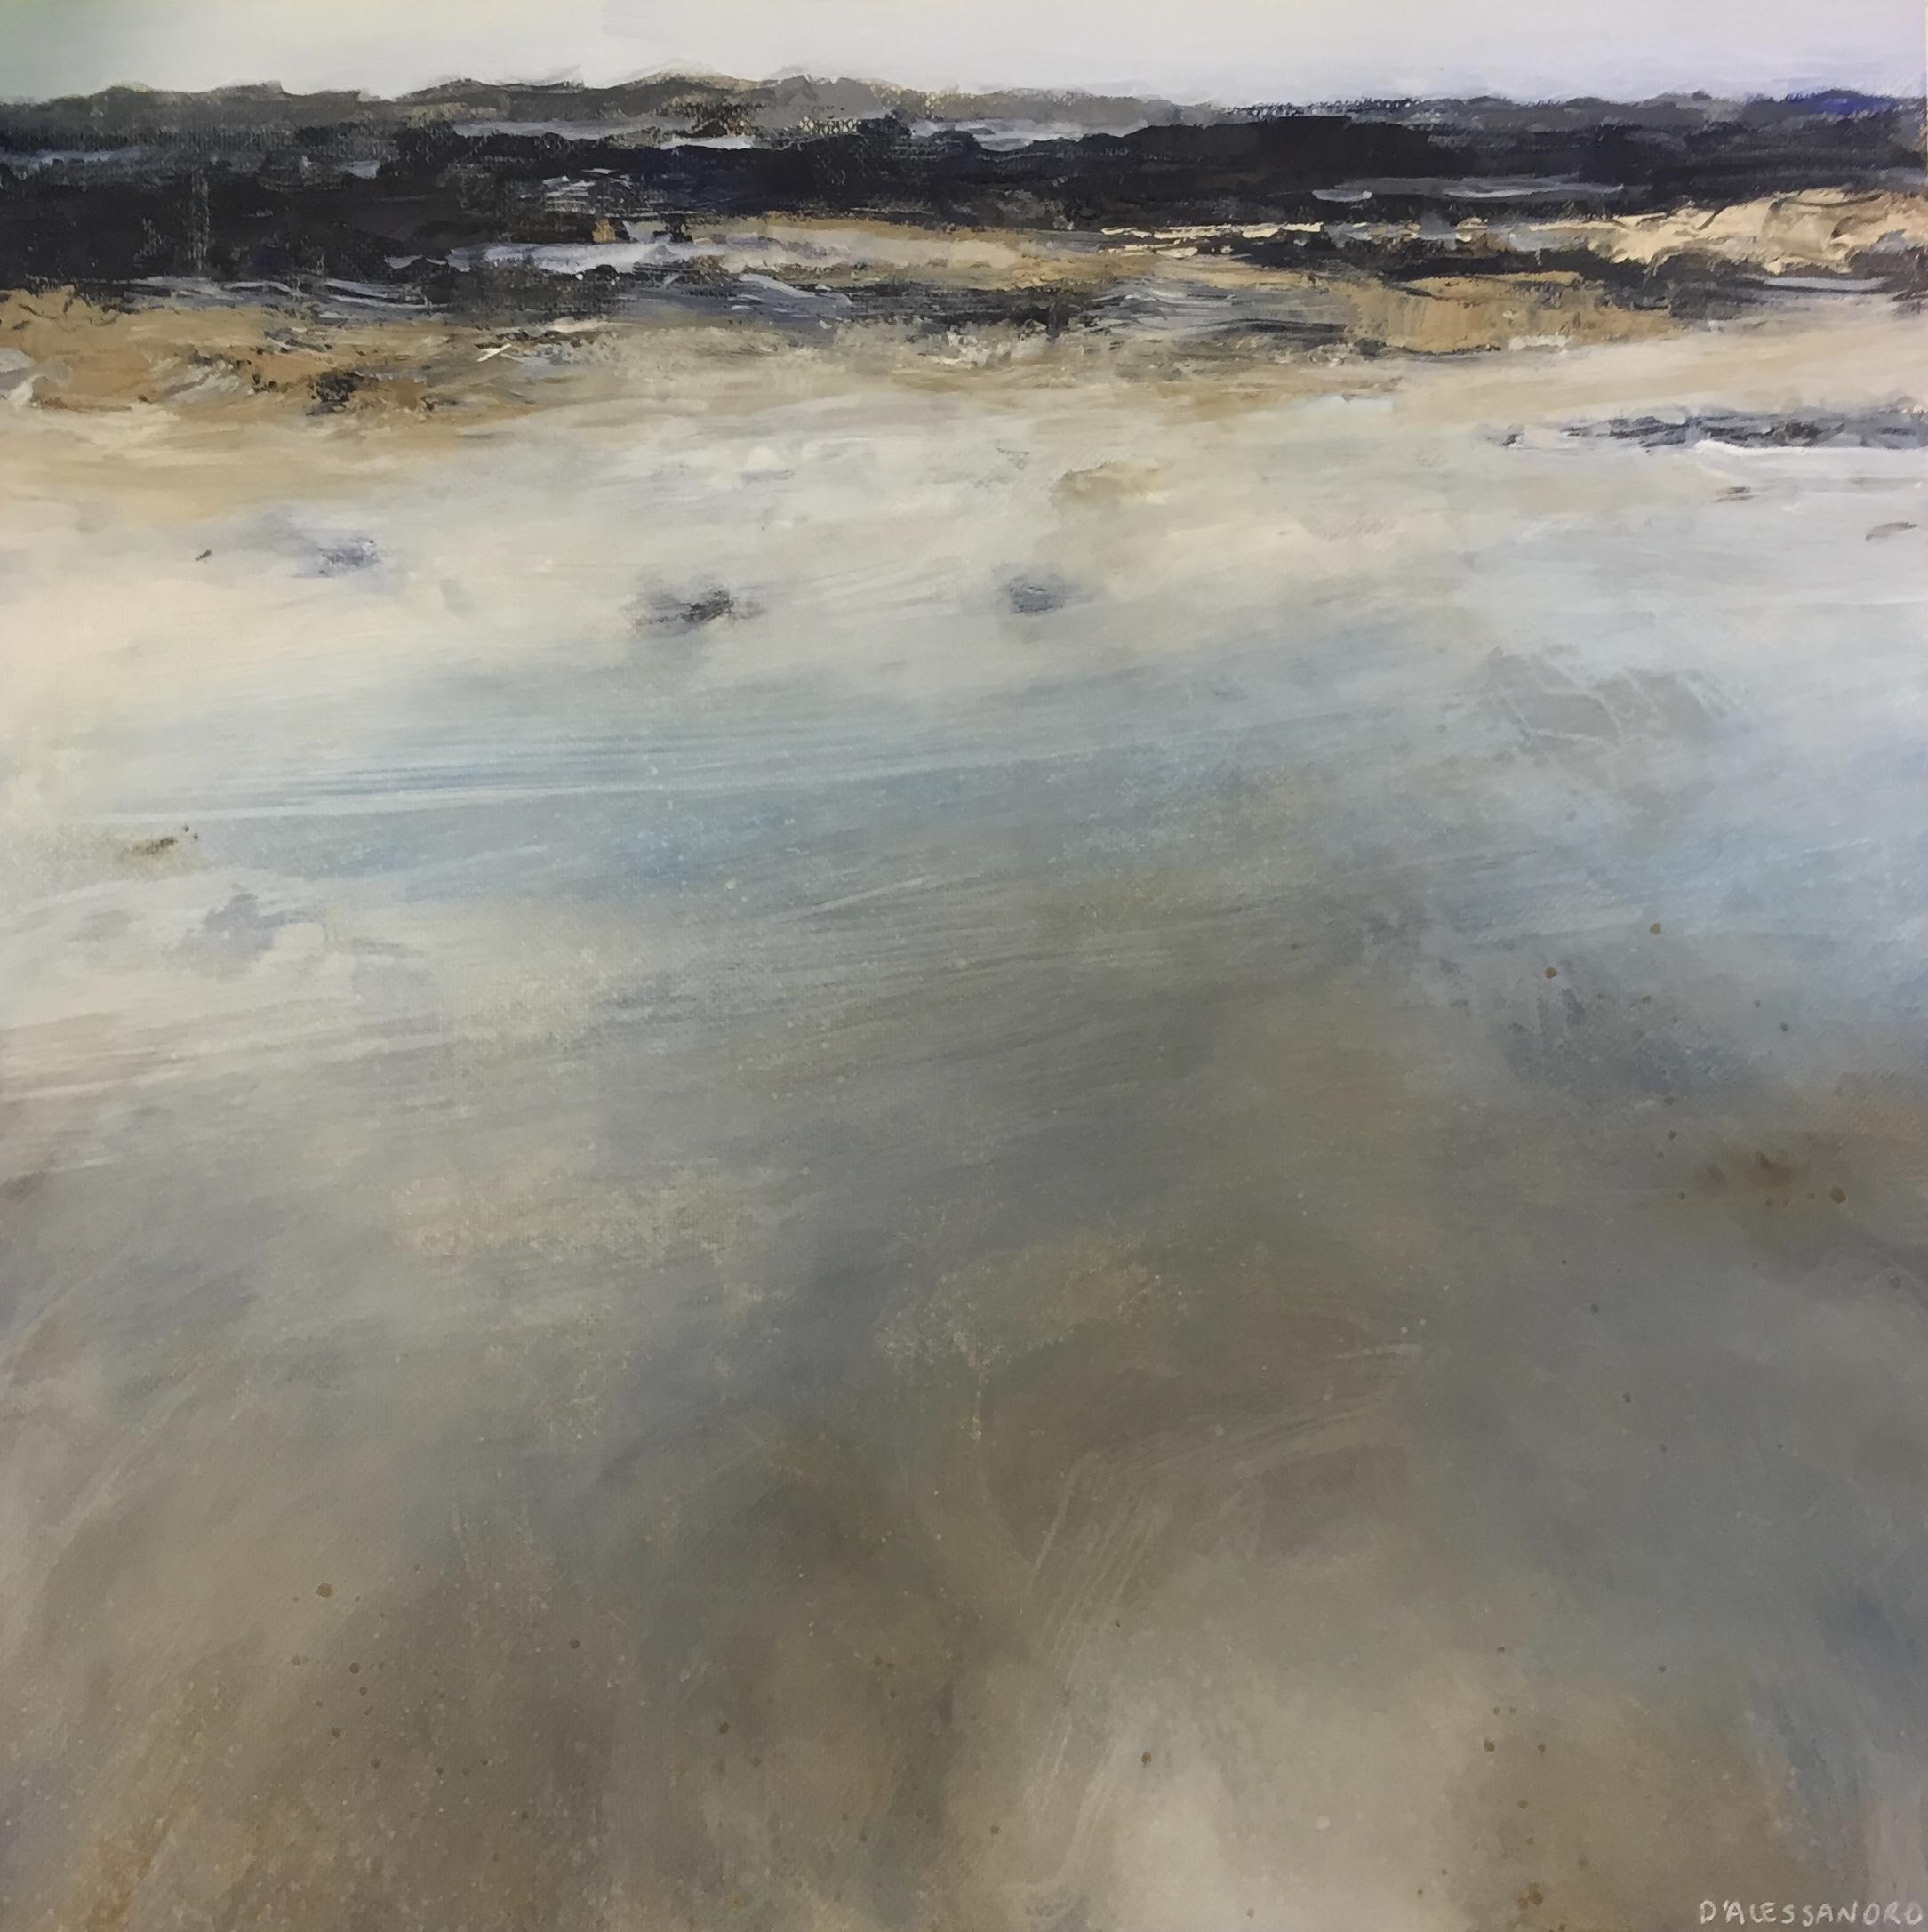 Sand L'Etacq